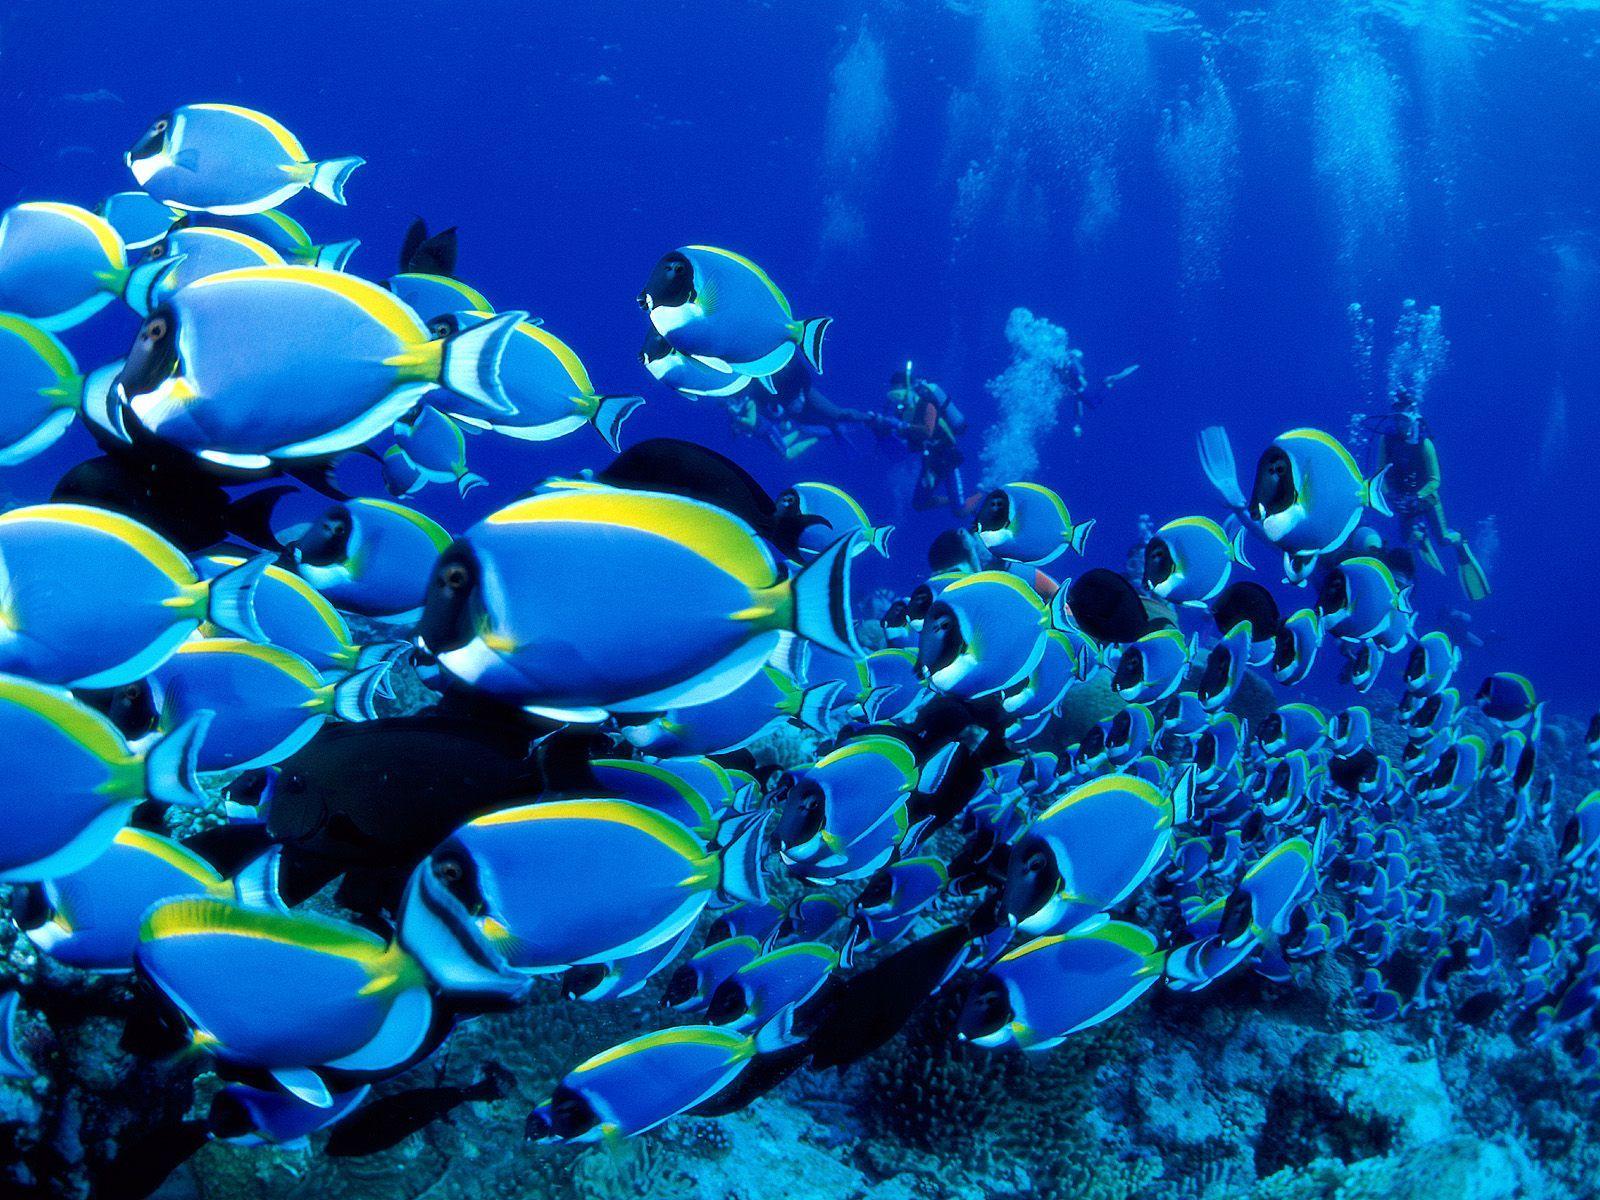 116447d1343196726 ocean life wallpaper ocean life wallpaper picture 1600x1200